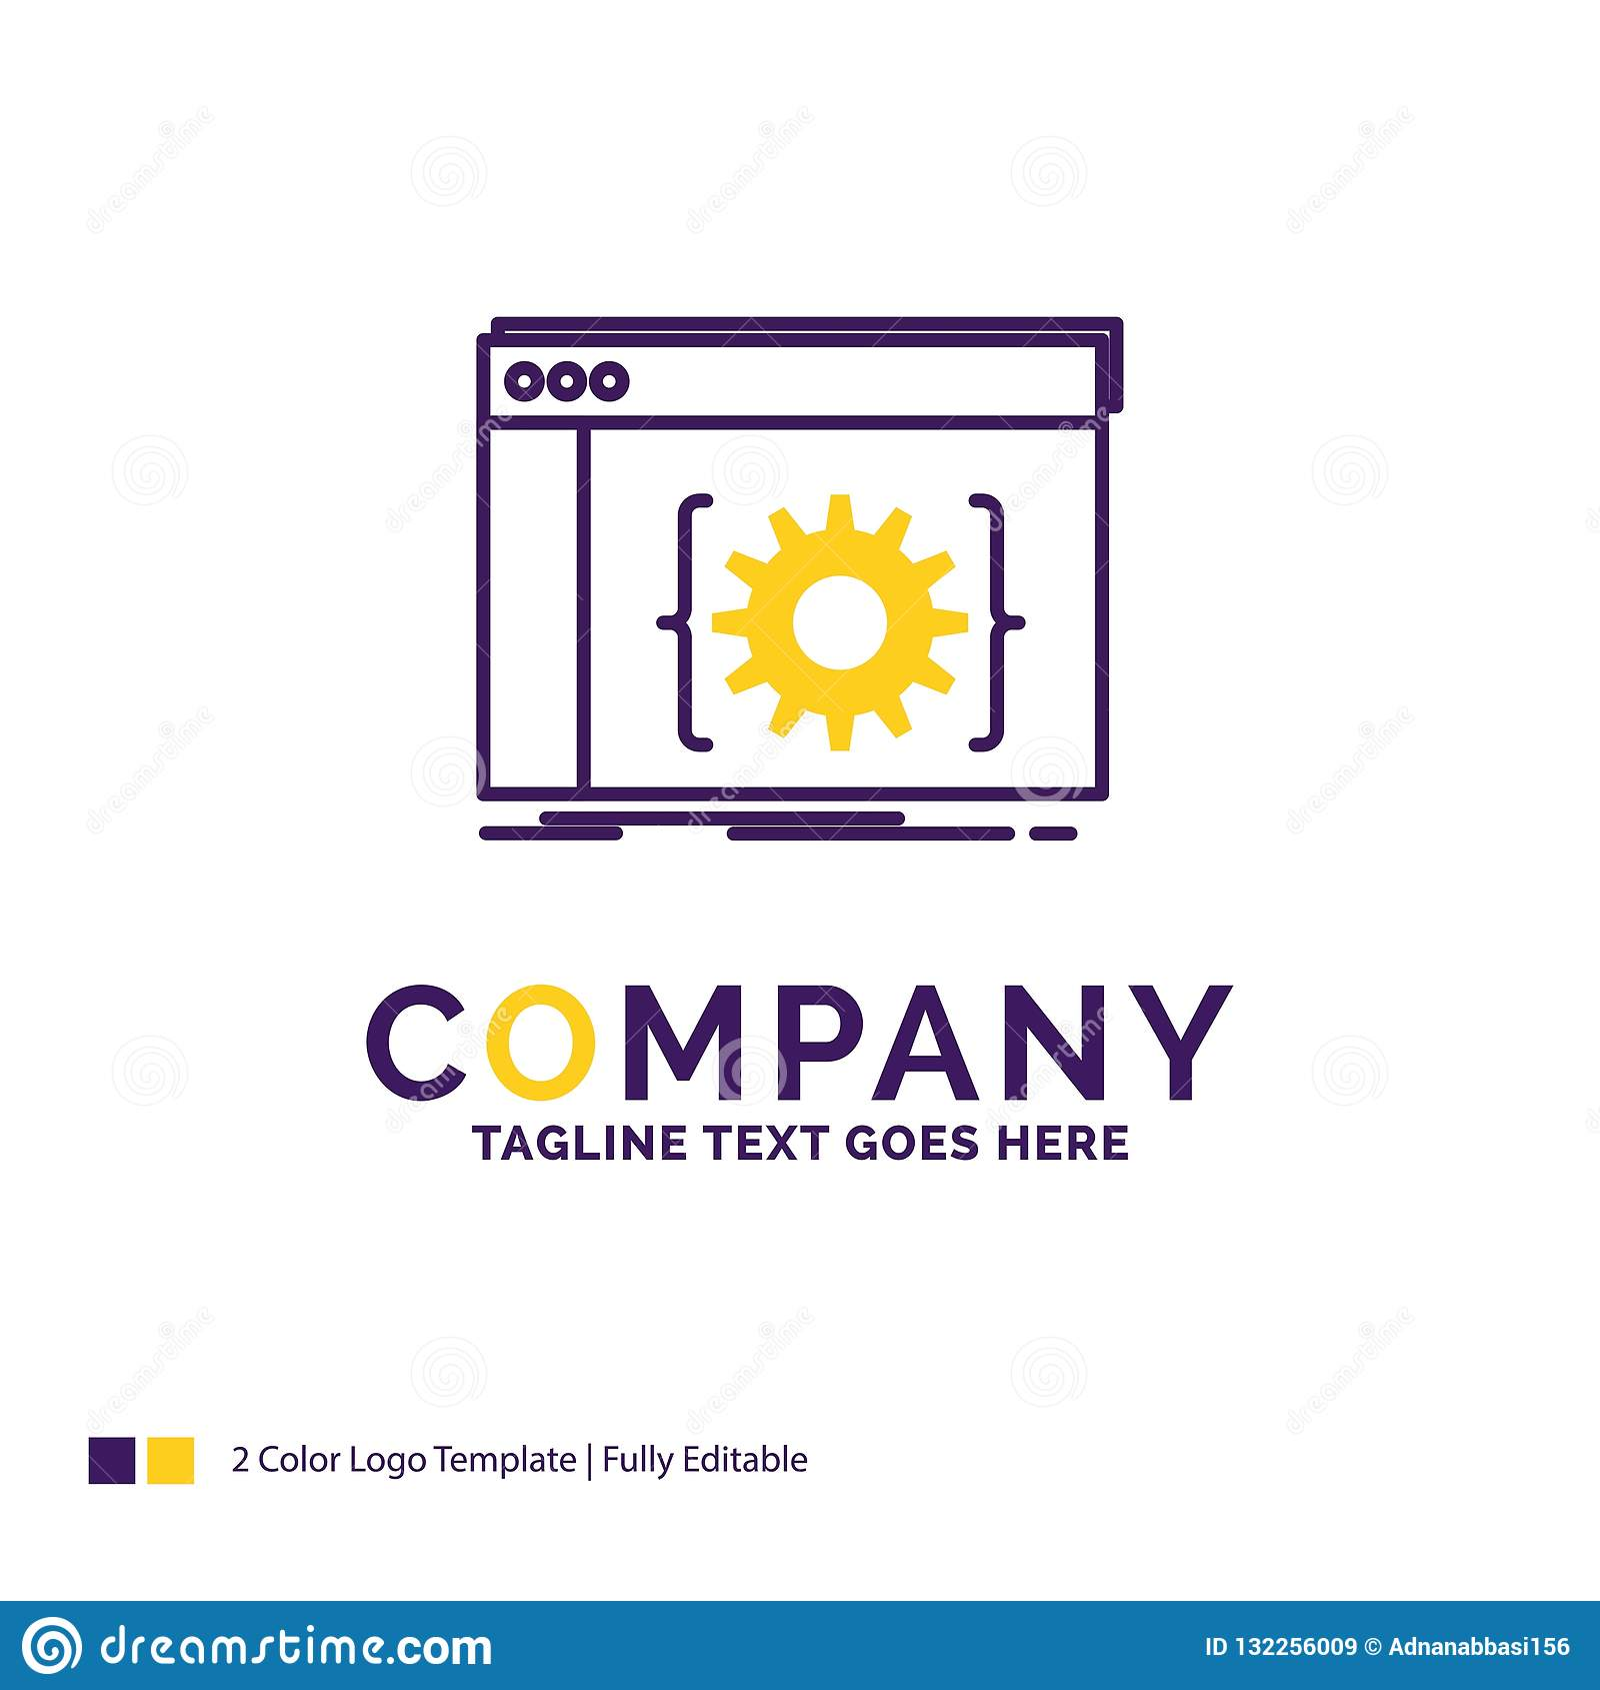 Company Name Logo Design For Api App Coding Developer Softwa Stock Vector Illustration Of Business Platform 132256009